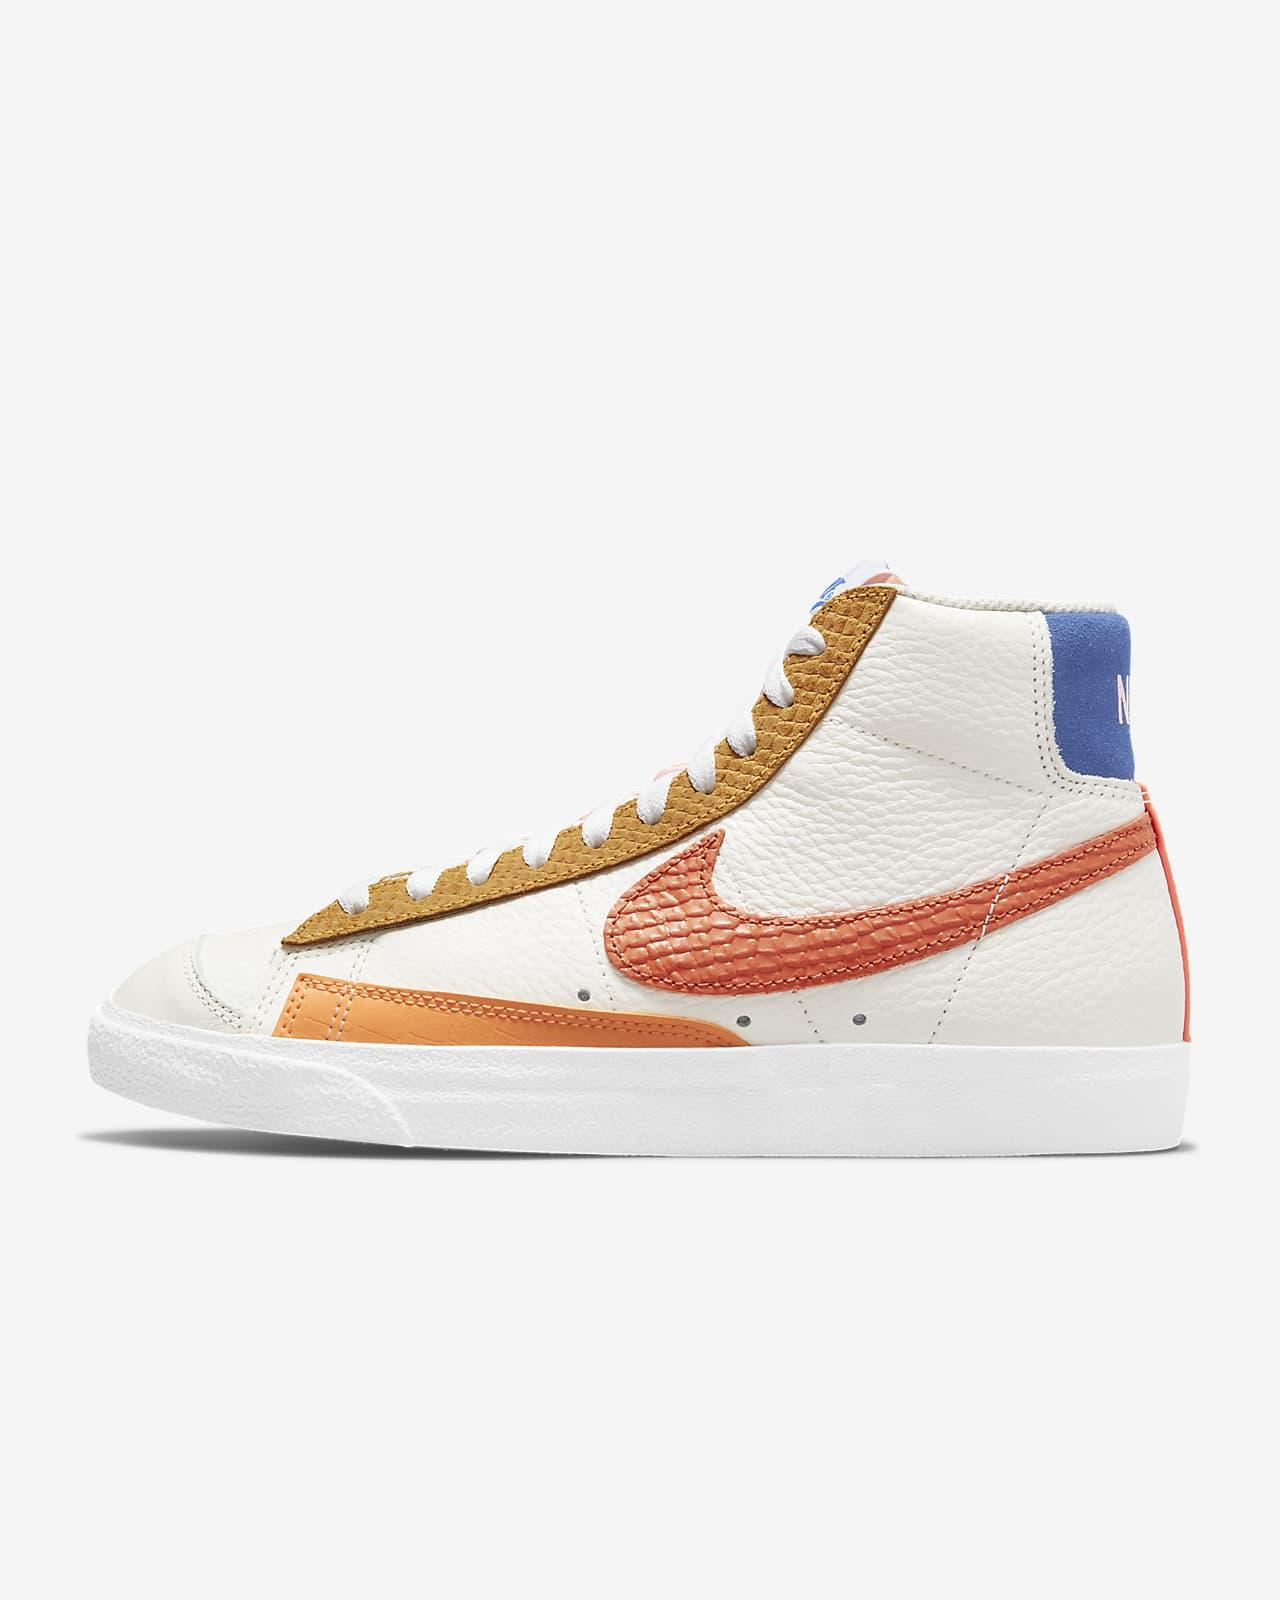 Chaussure Nike Blazer Mid '77 pour Femme. Nike LU